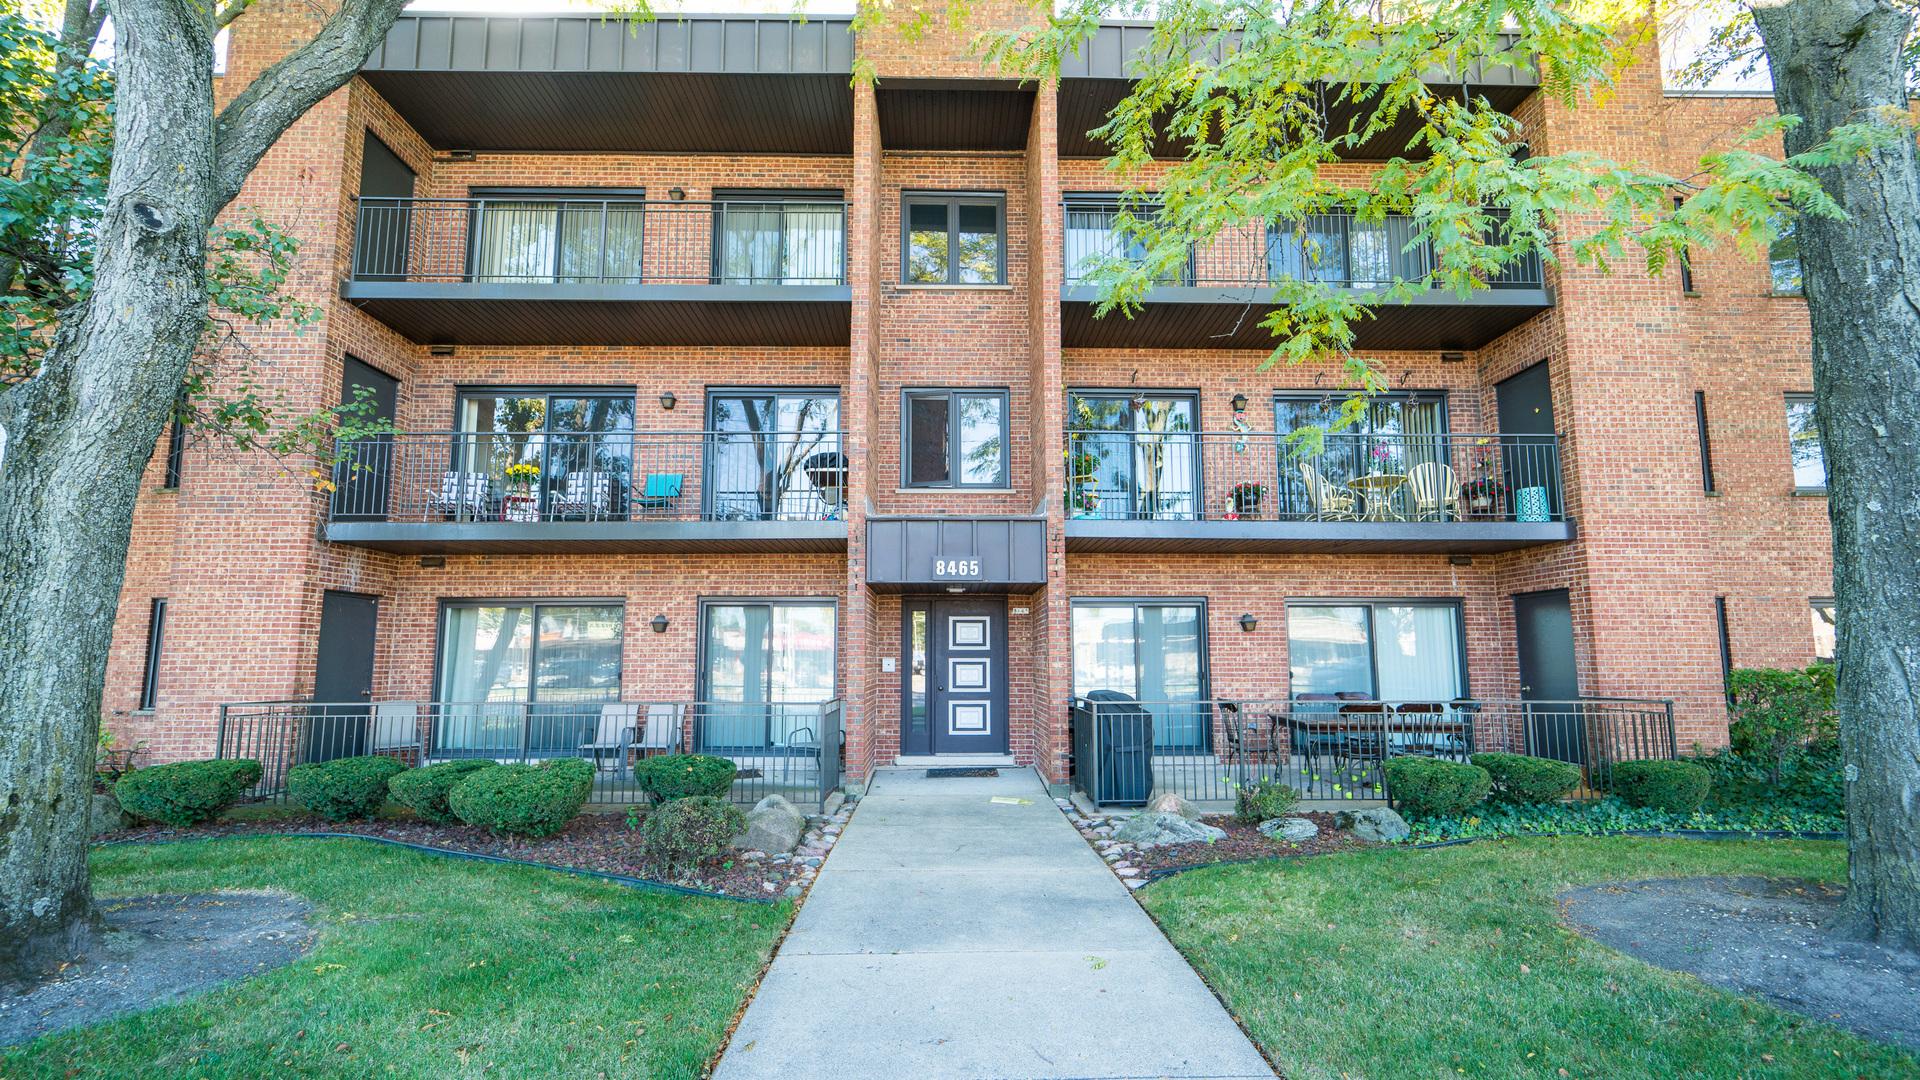 8465 W Lawrence Avenue Unit 2B, Chicago IL 60656